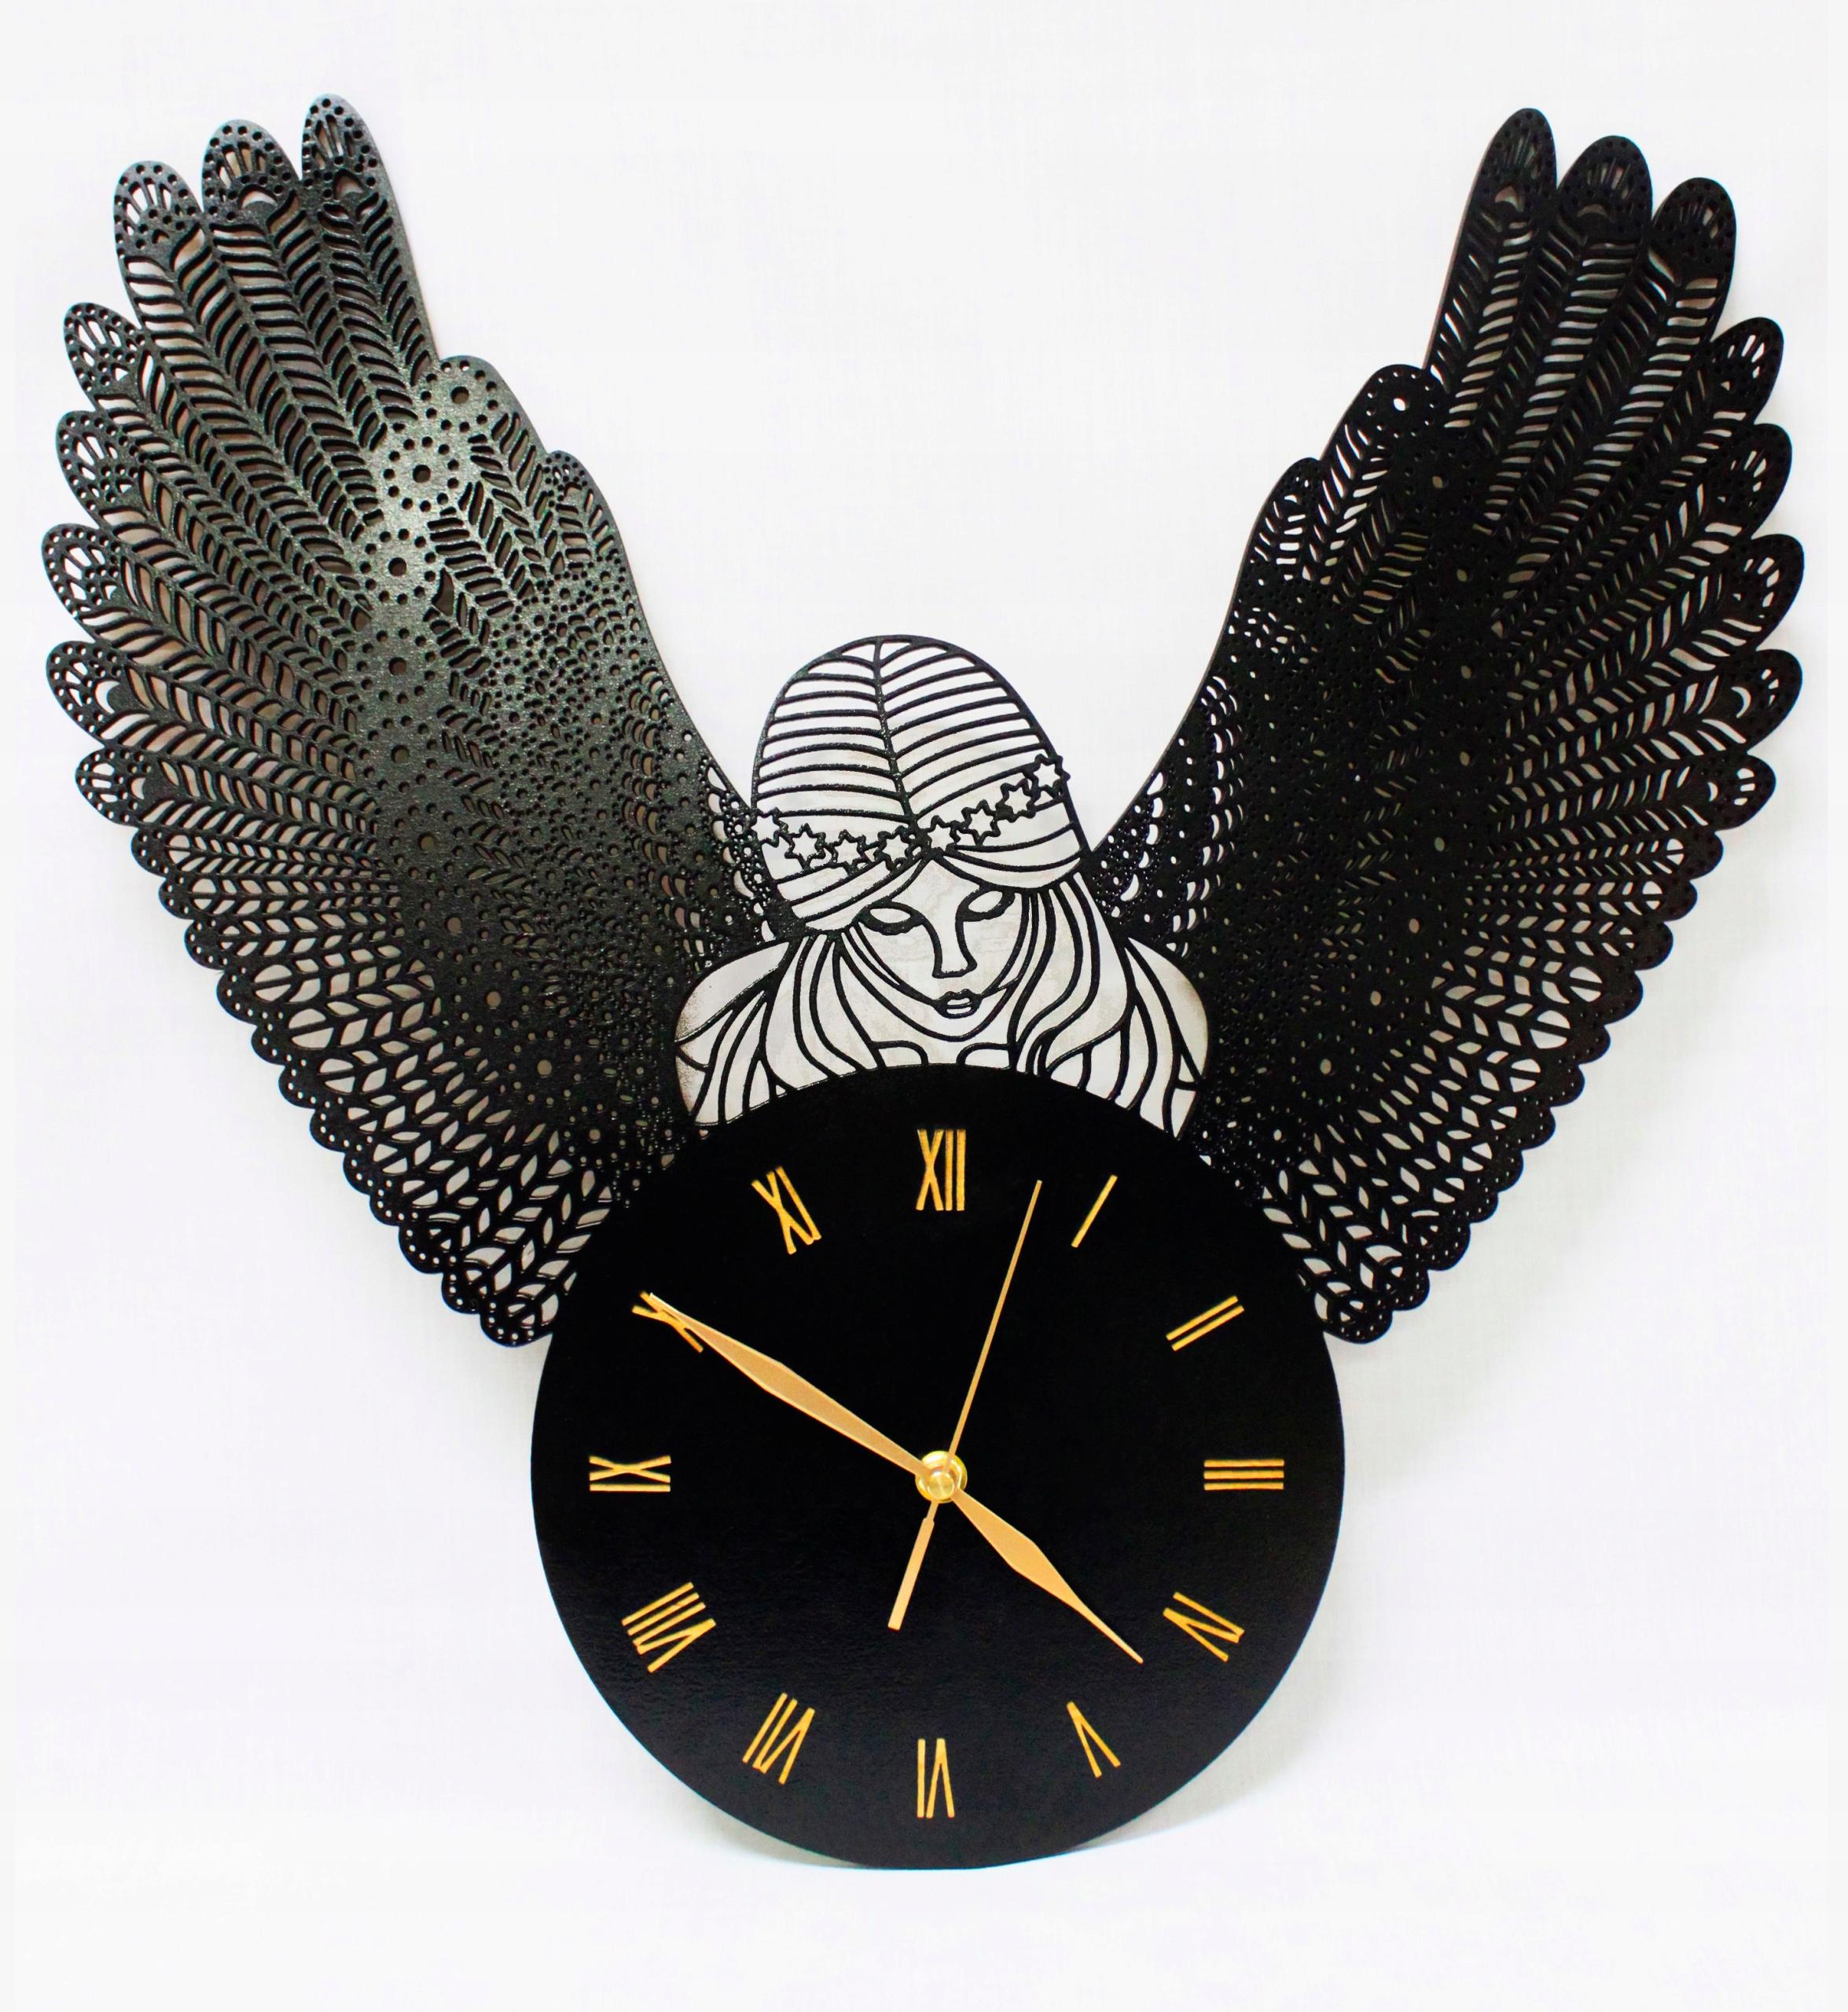 Hodiny Veľký anjel Amor Glamour Retro Vintage Seraph